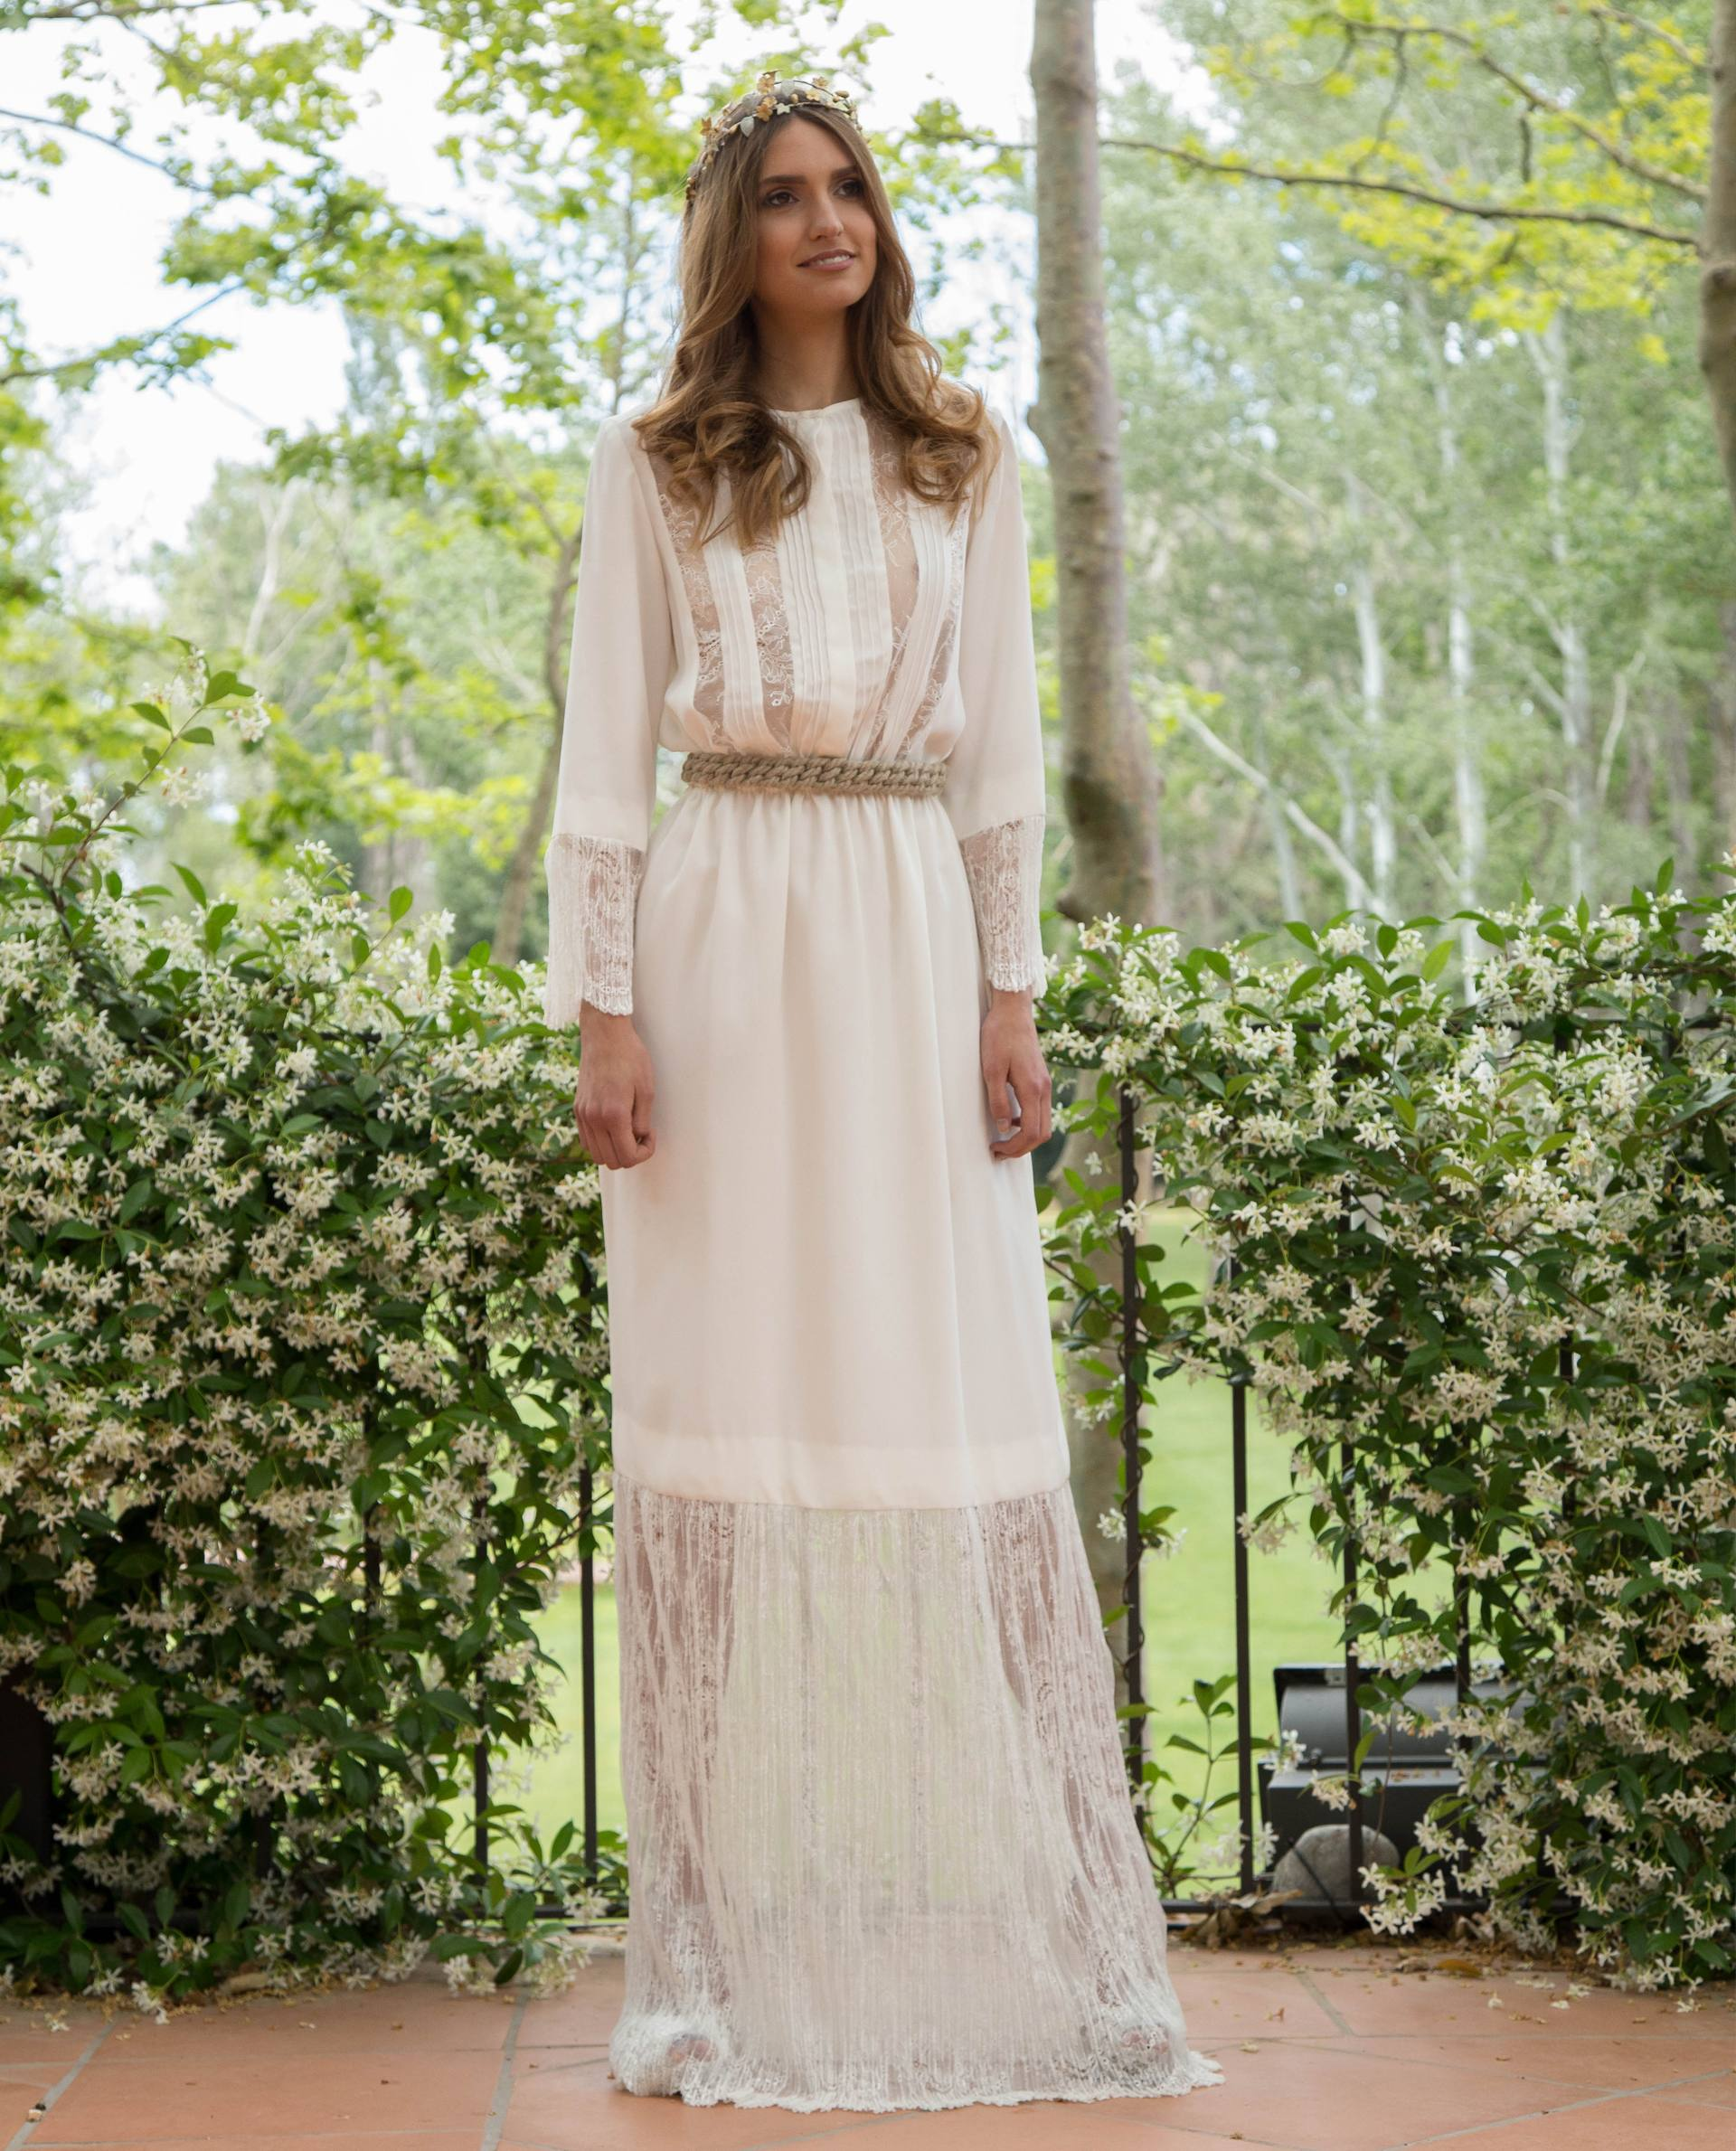 BRIDAL-NATURE 2017/18 - VESTIDOS - vestido novia Andrea